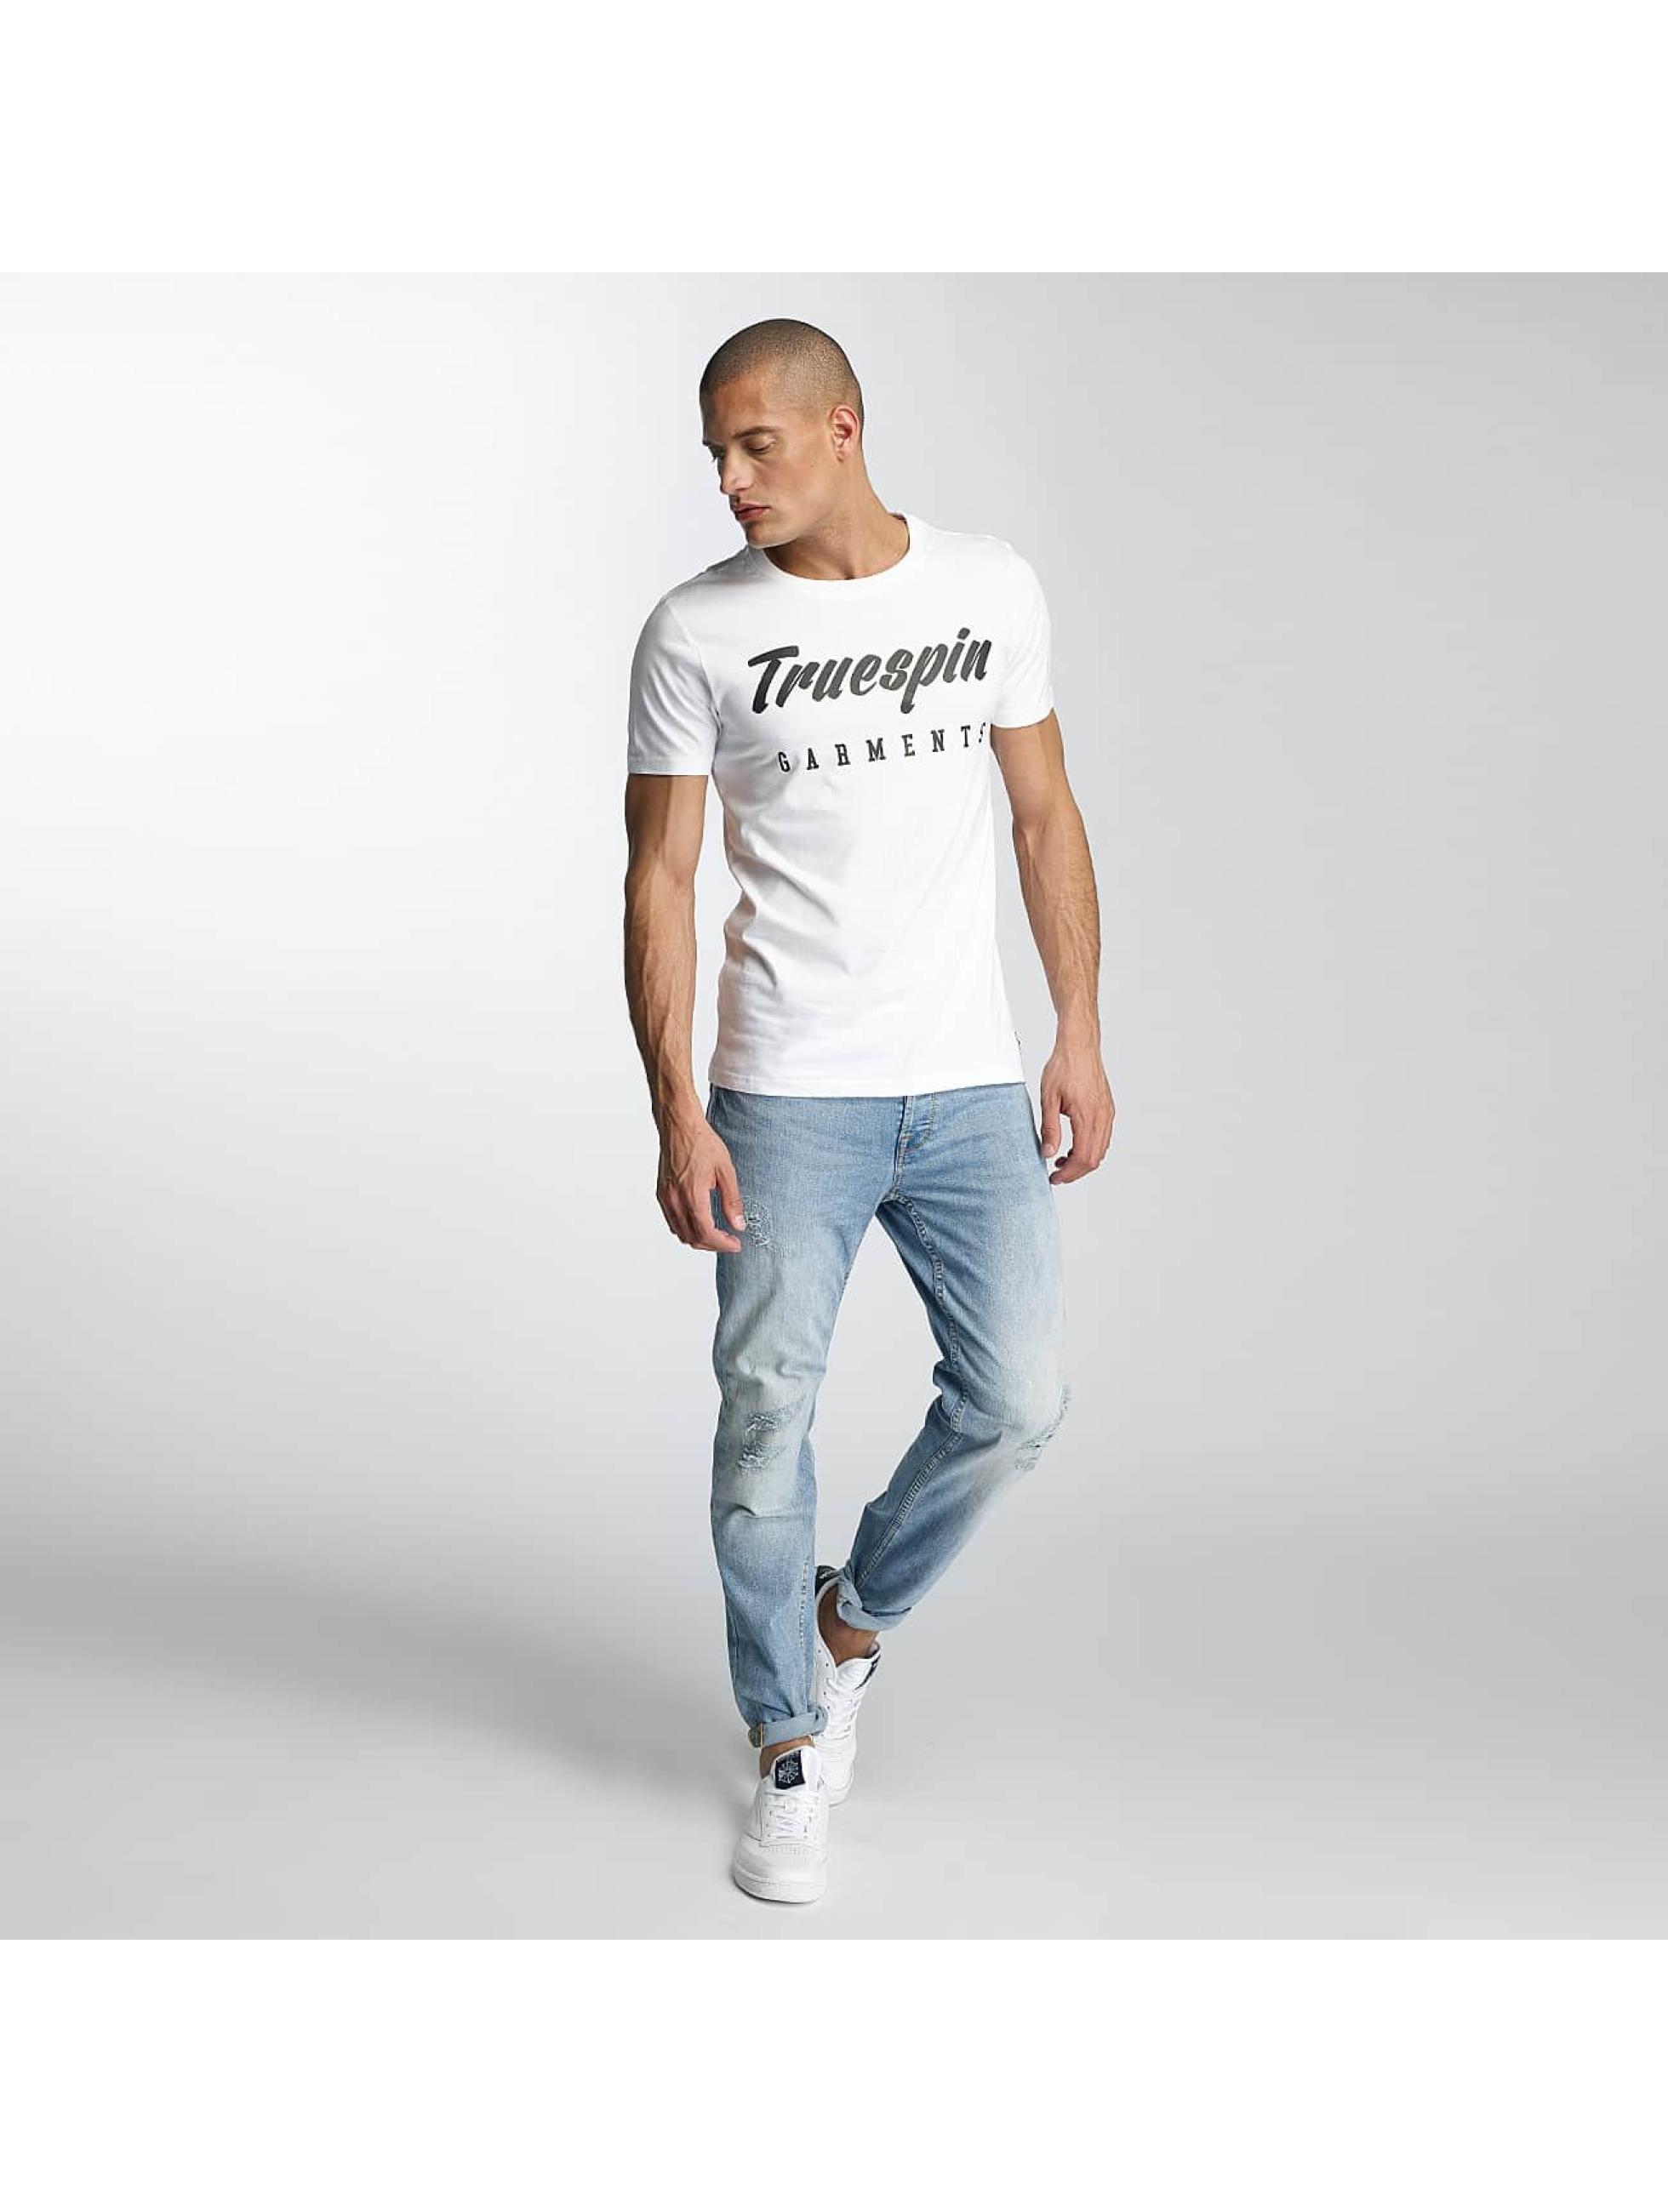 TrueSpin Camiseta 7 blanco